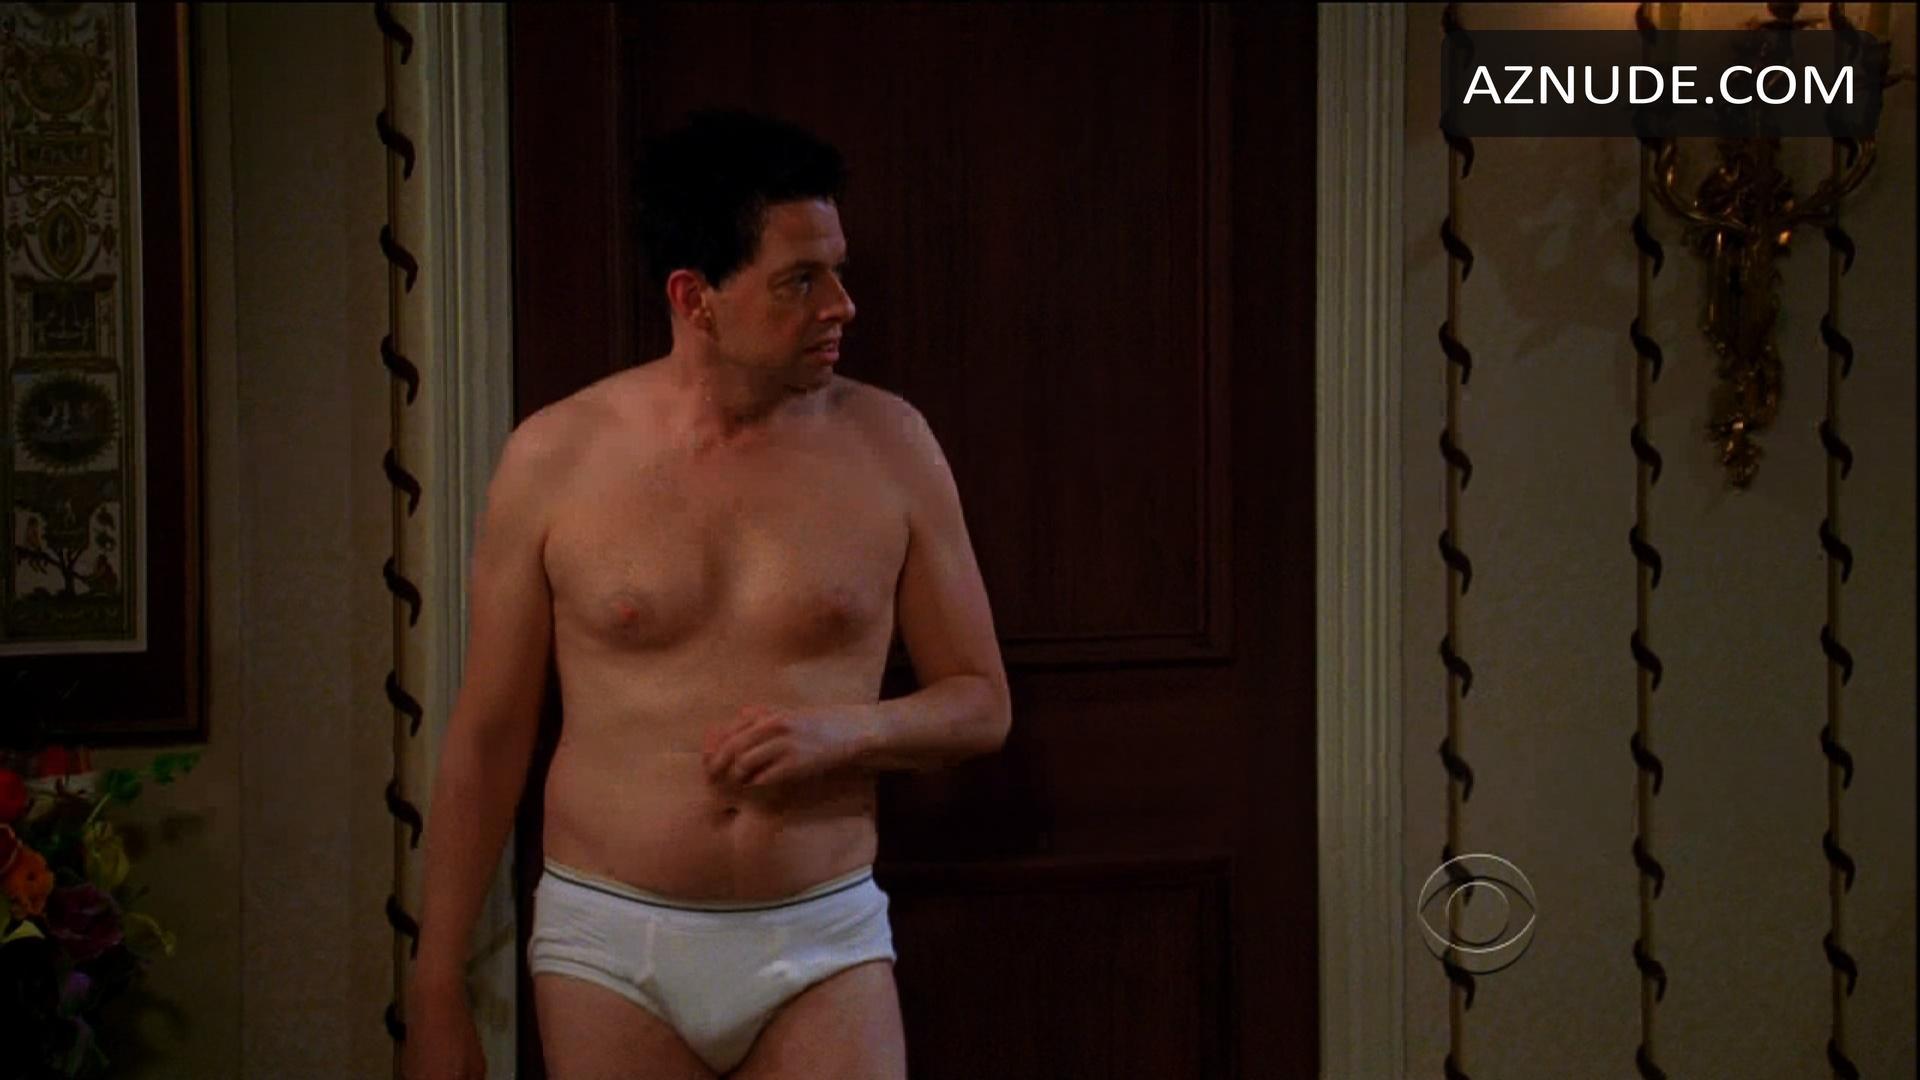 Jeff probst naked celebrity